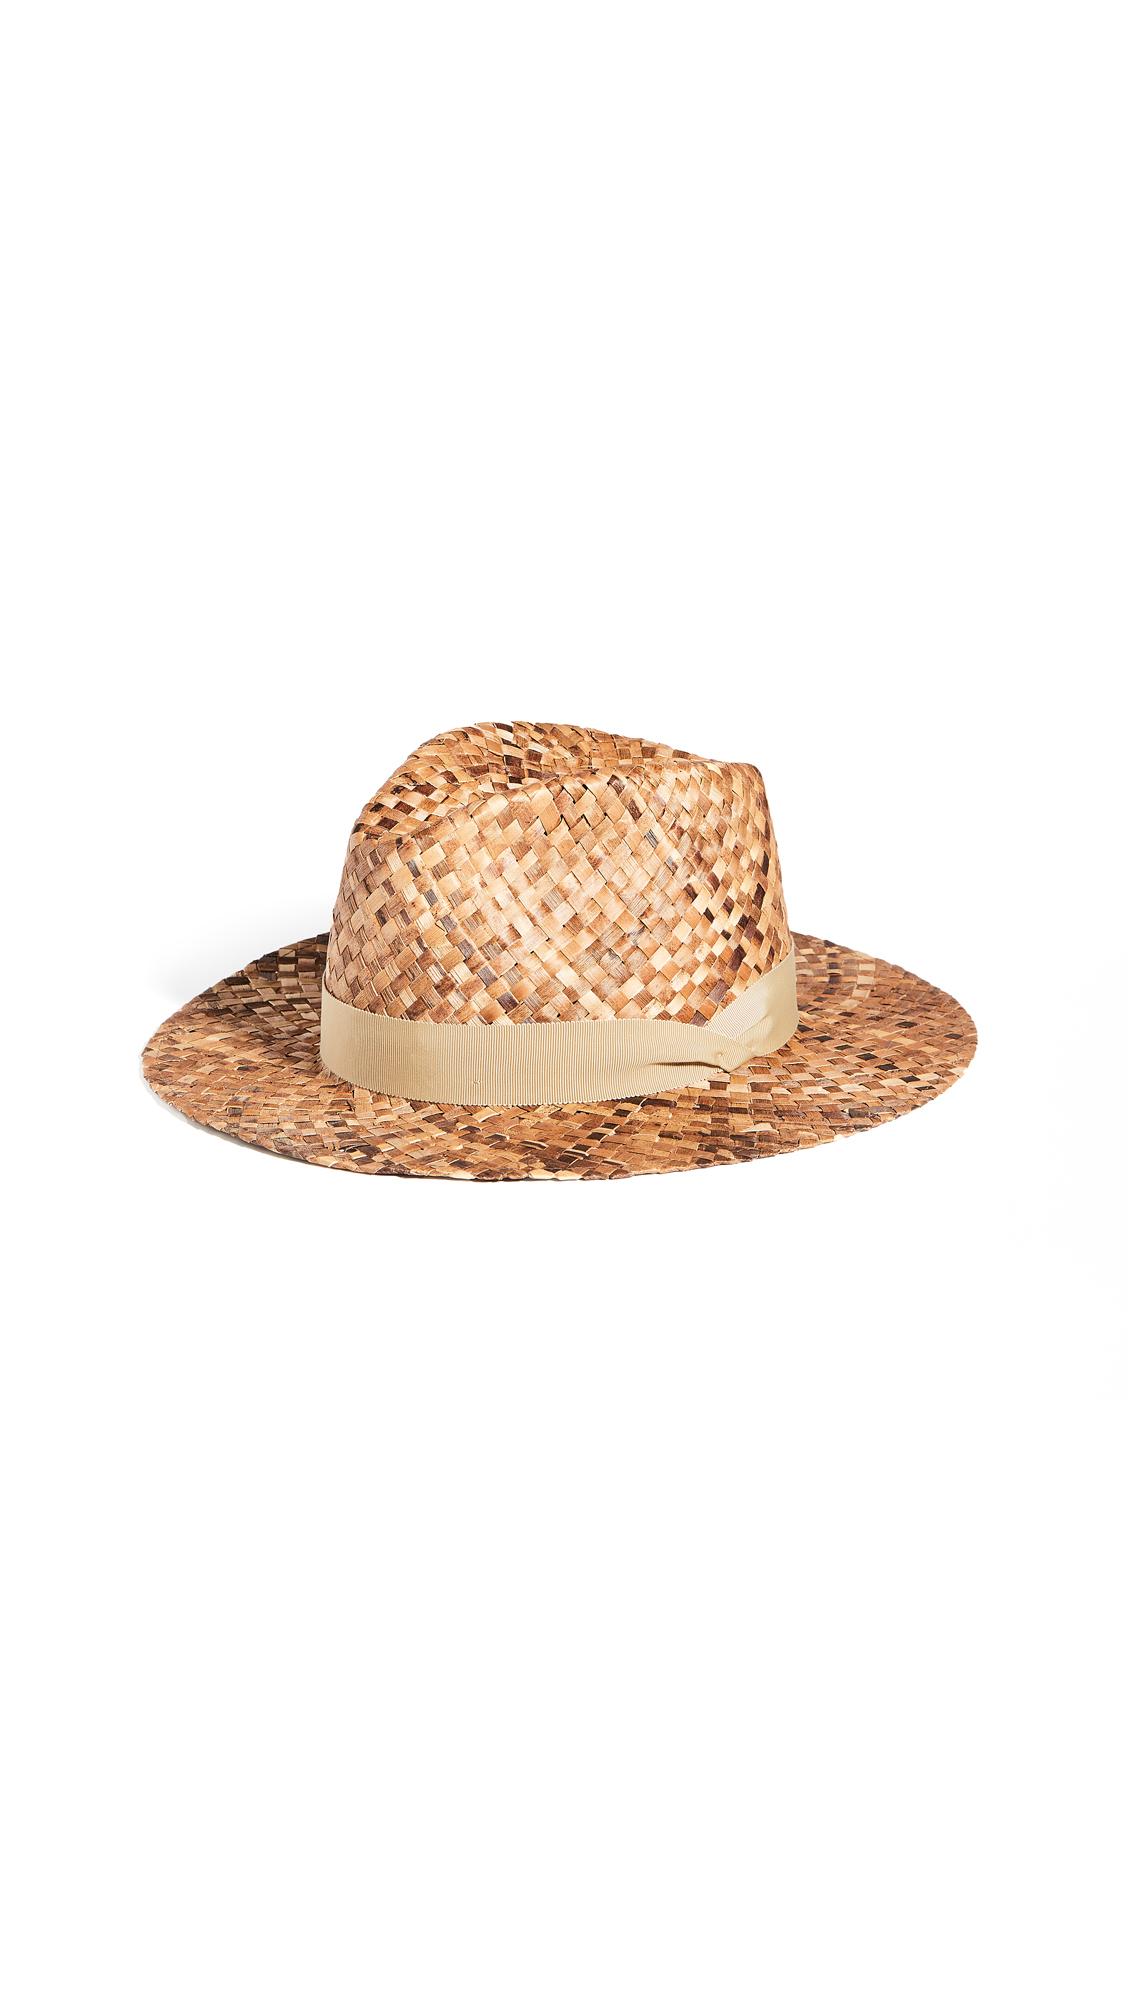 Rag & Bone Coconut Straw Fedora